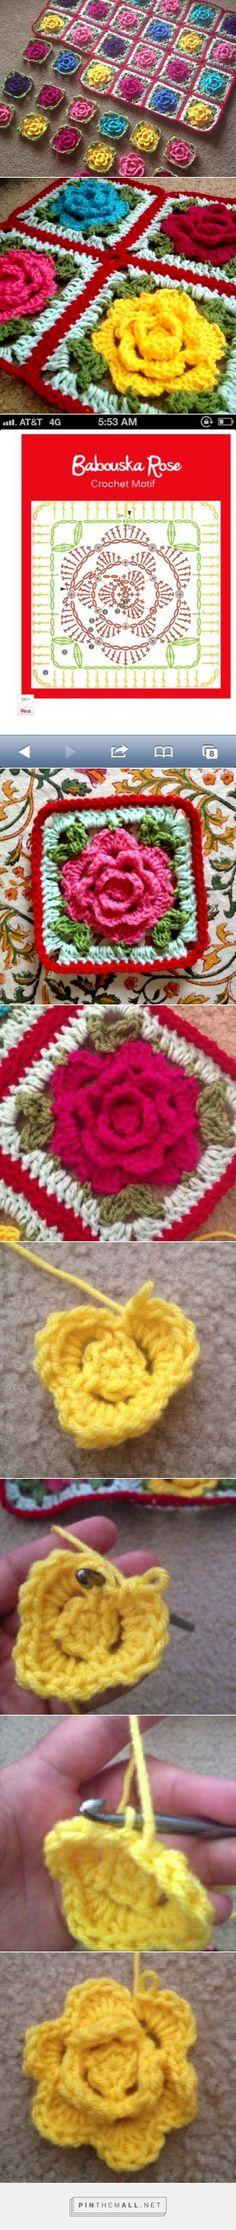 Babouska Rose Blanket Tutorial | BabyLove Brand - created via http://pinthemall.net